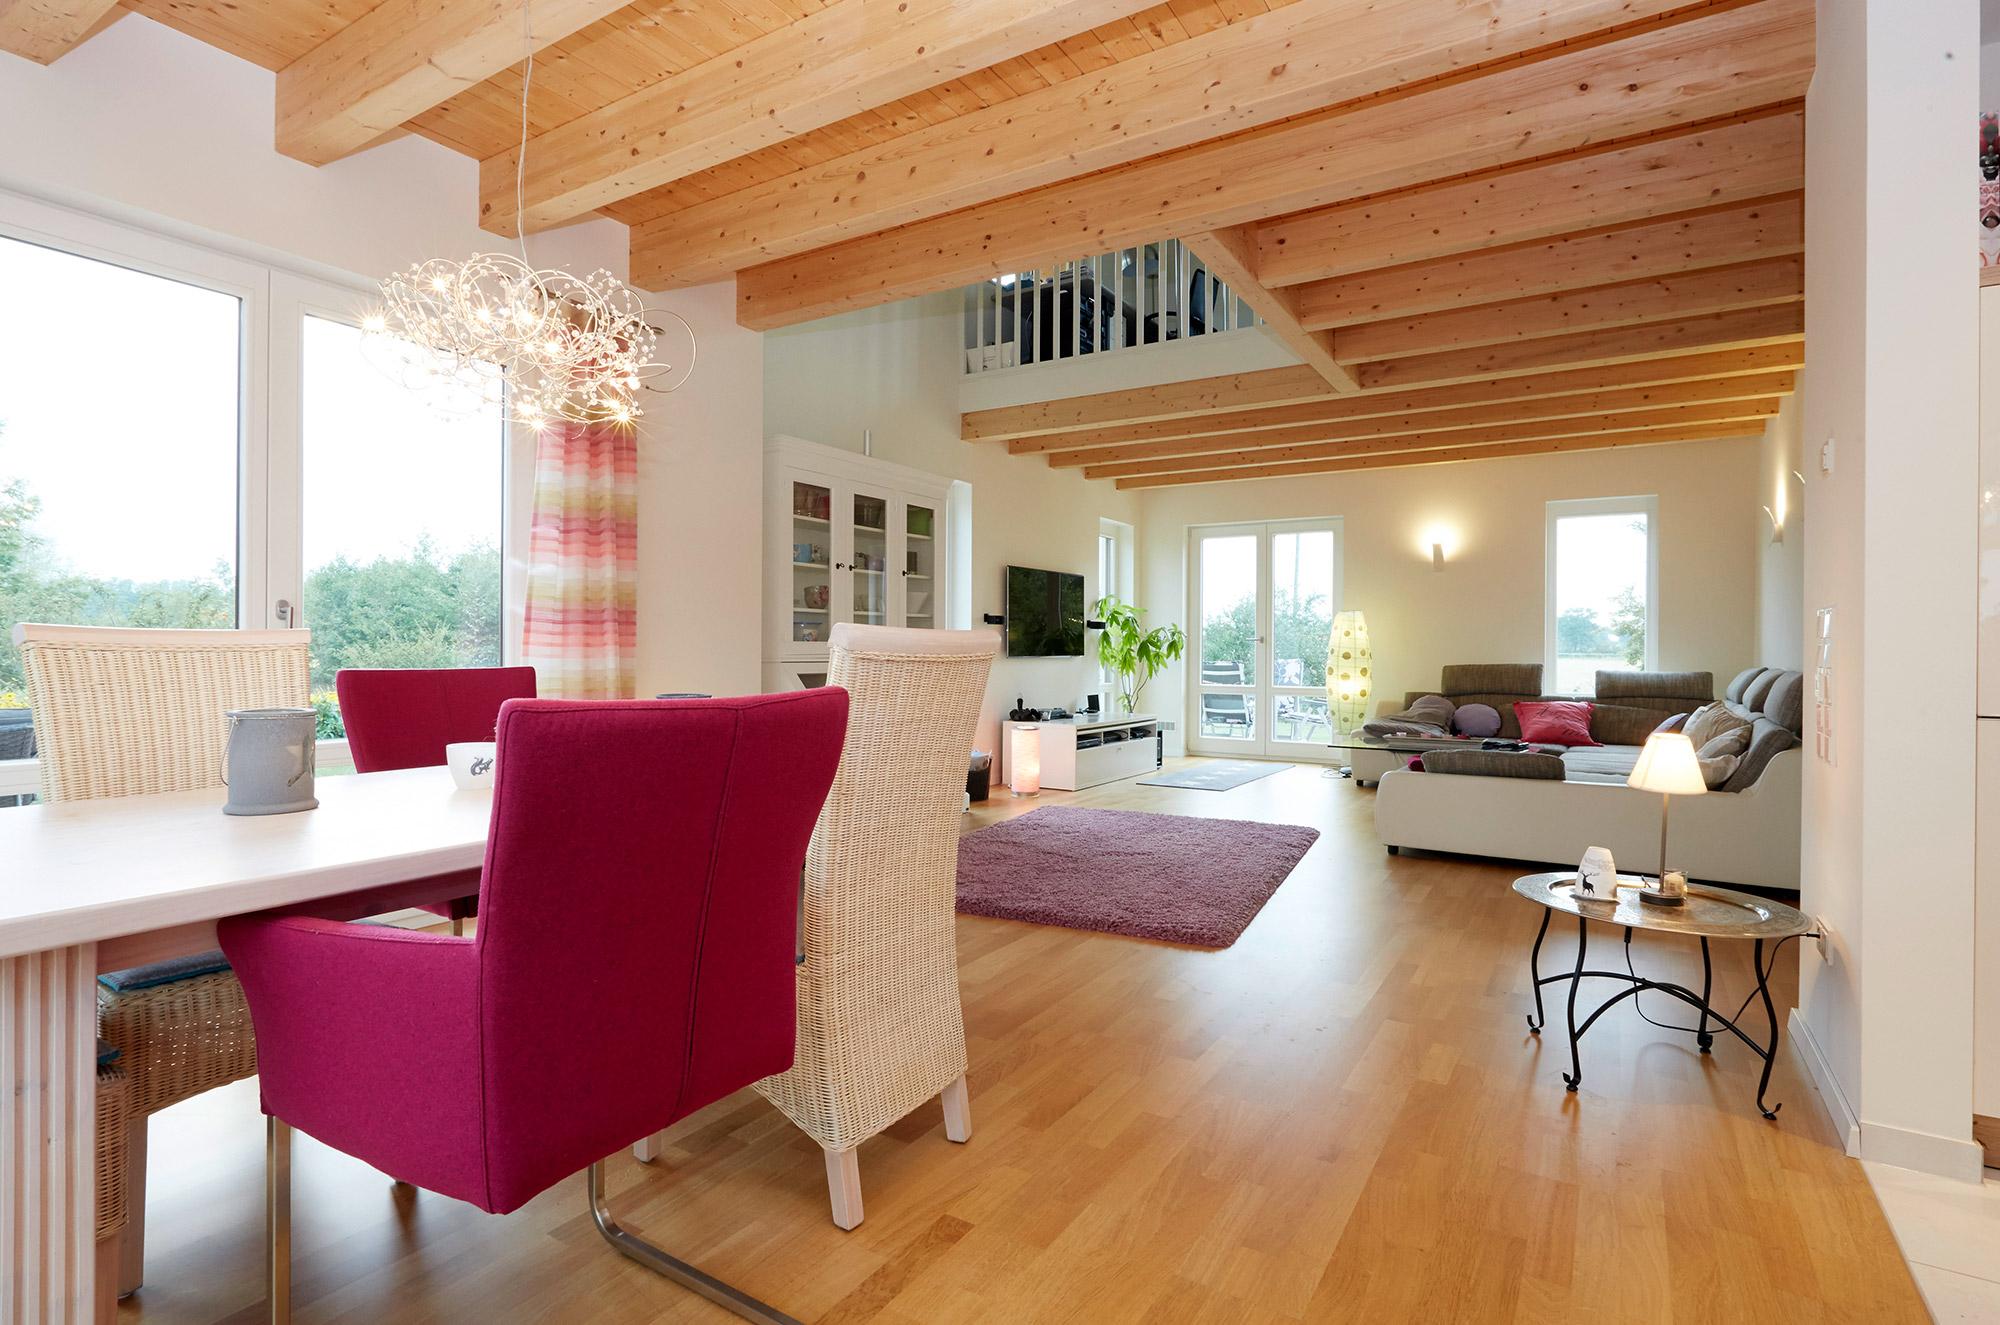 Hausbau Wipperfürth